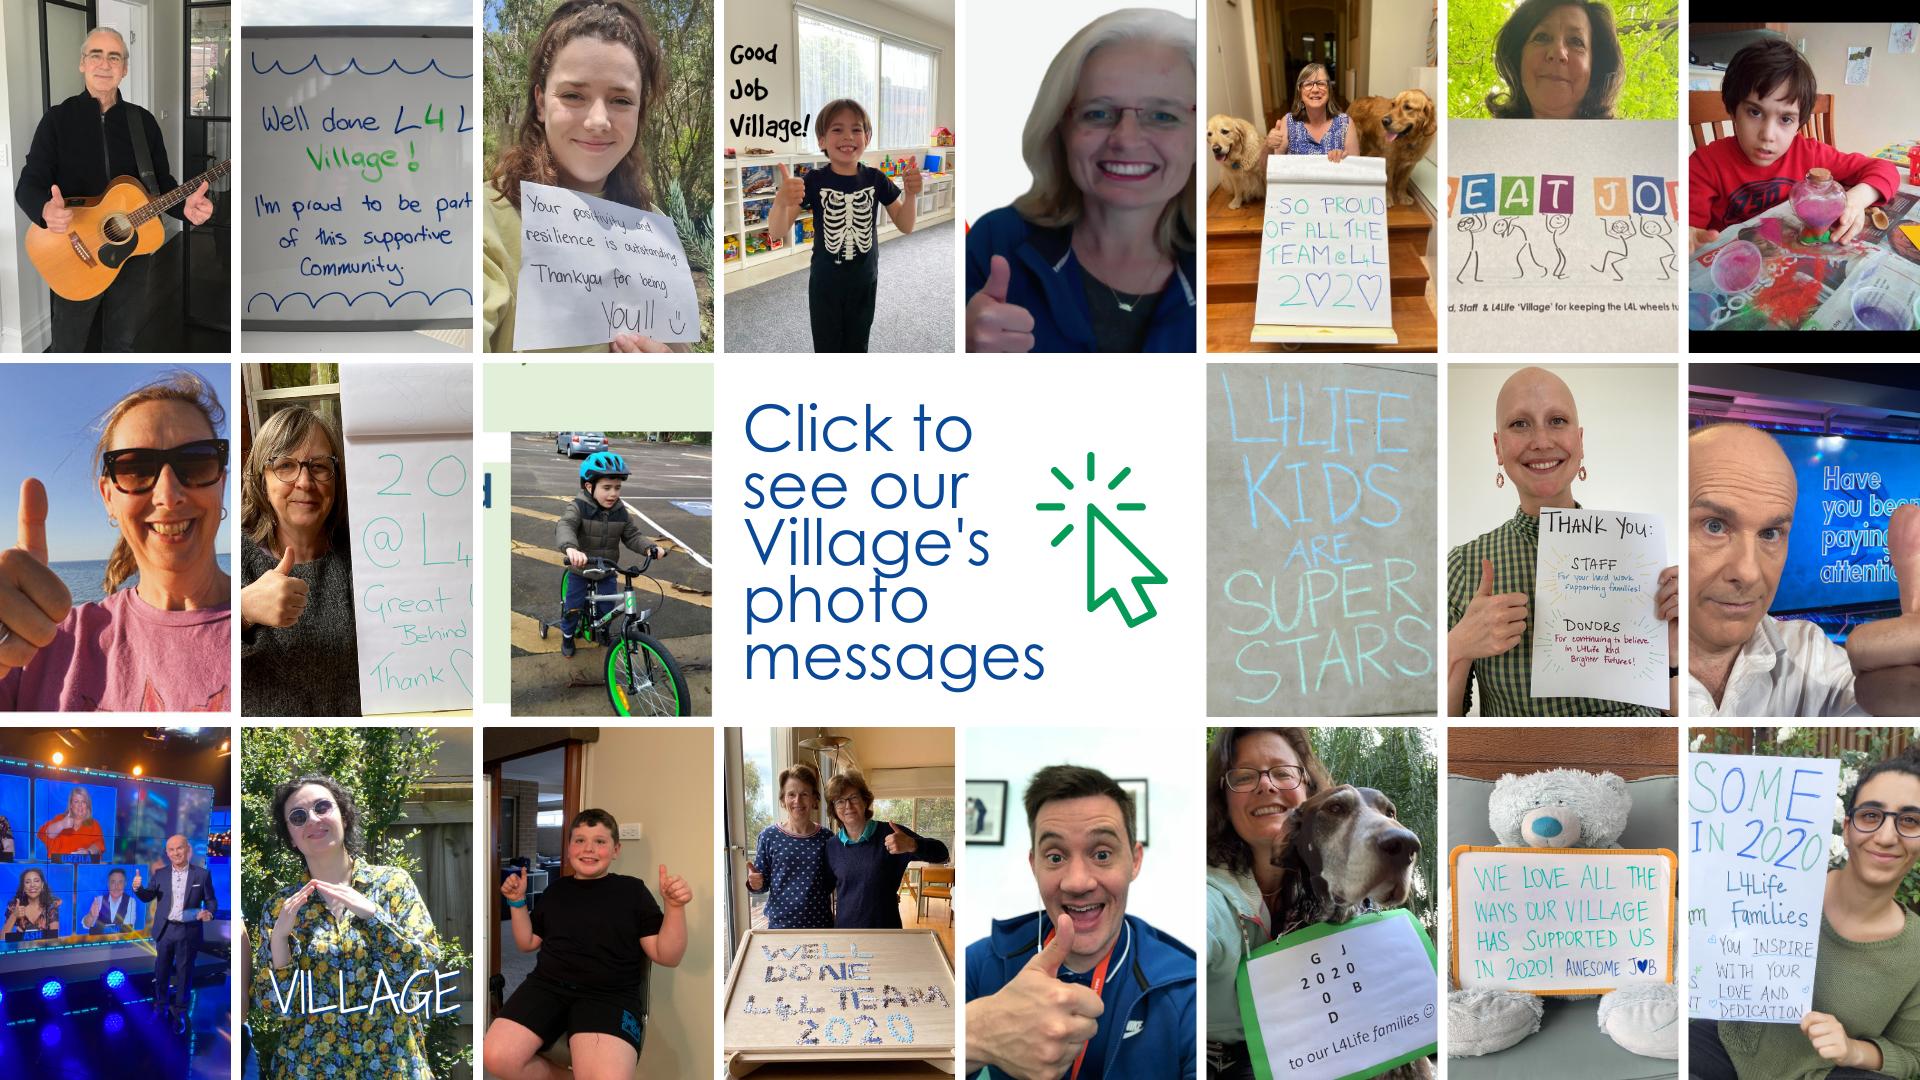 2020 Good Job Village - photos of messages